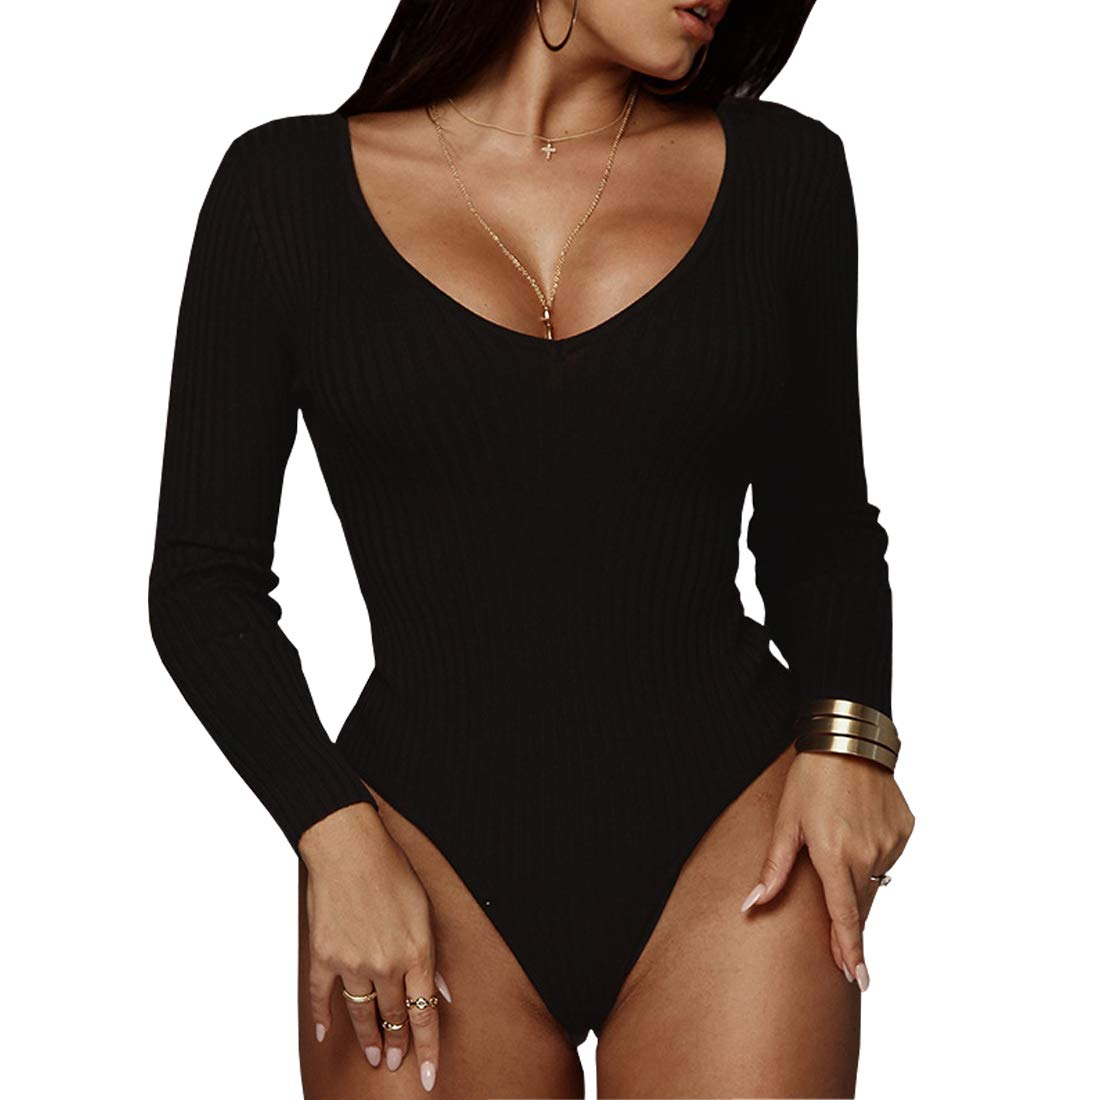 83e6813d4b2 Amazon.com  Weigou Women Jumpsuits Deep V Neck Long Sleeve Bodycon Stretch  Jumpsuit Leotard Bodysuit Tops  Clothing